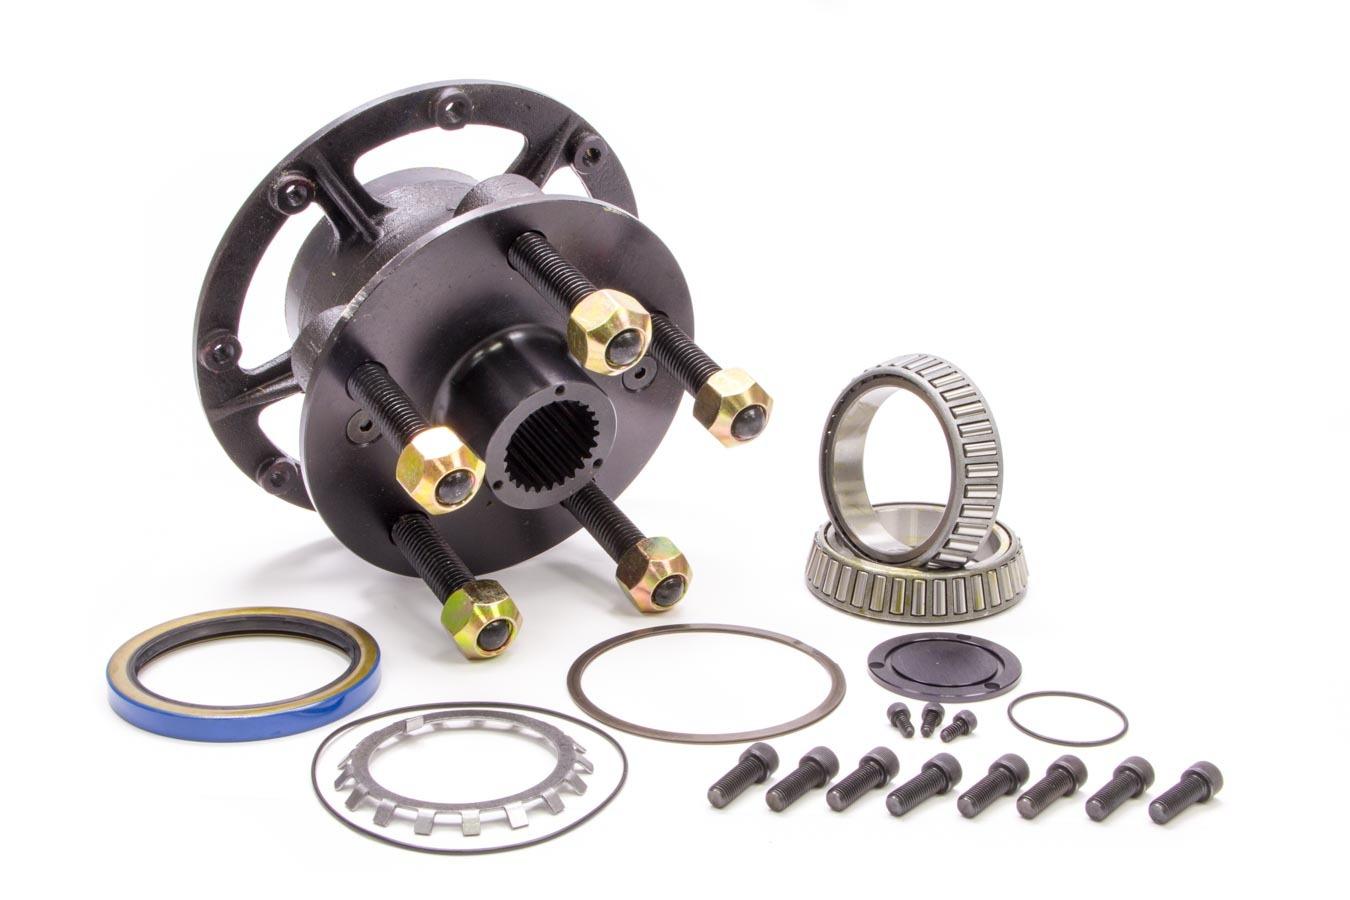 Diversified Machine CRC-2000 Wheel Hub, Rear, 5 x 5.00 Wheel, Bearings / Dust Cap / Hardware / Wheel Studs Included, Seals, Steel, Black, Kit